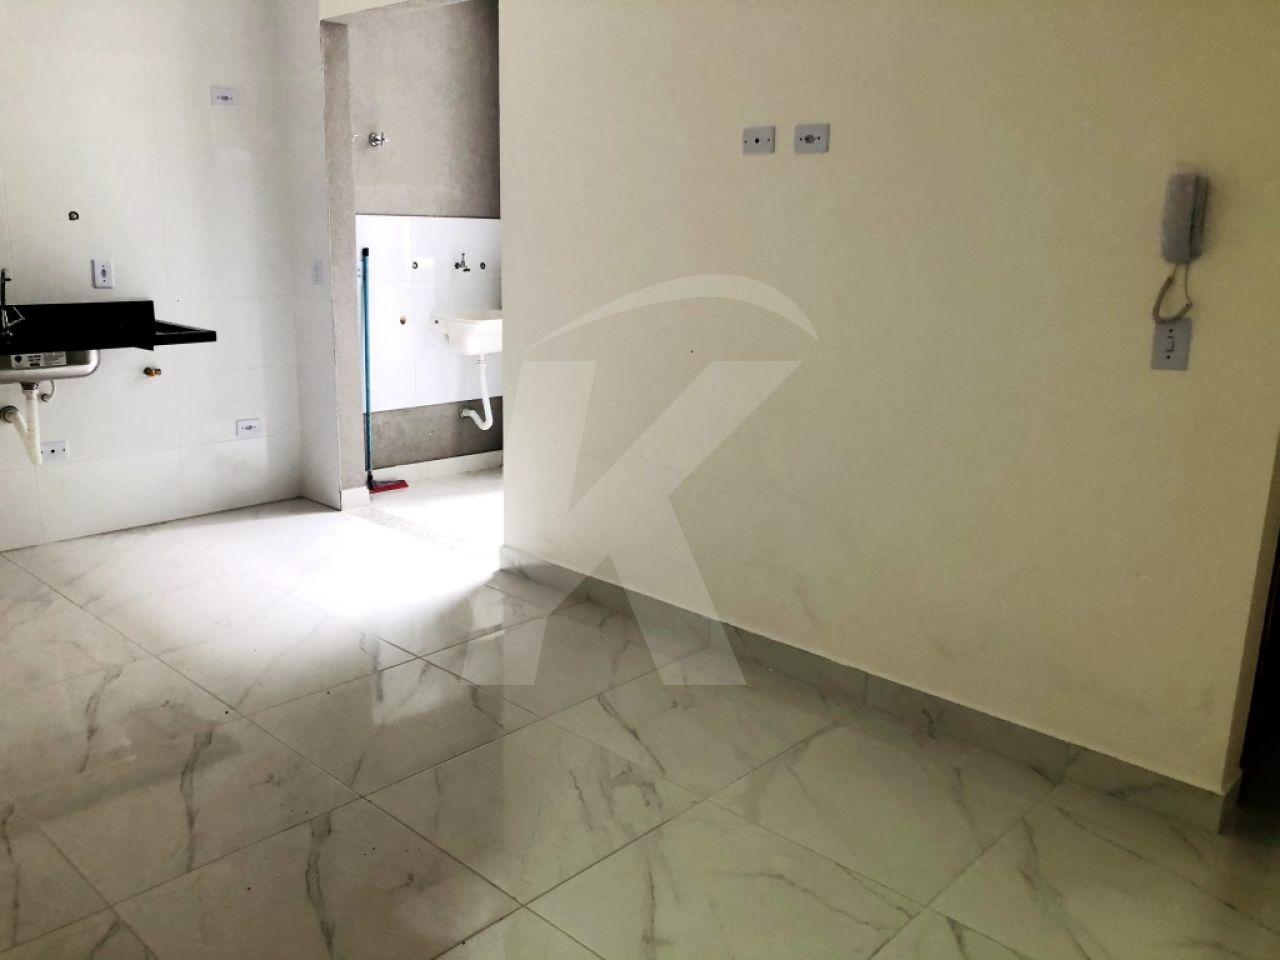 Condomínio Carandiru - 1 Dormitório(s) - São Paulo - SP - REF. KA13220